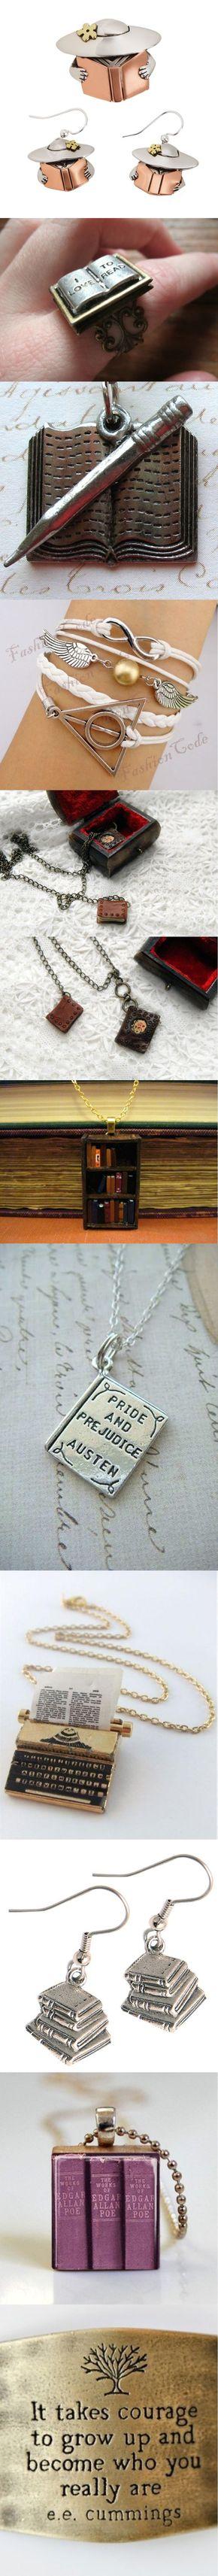 Para los lectores ávidos http://pinterest.com/okknihovna/jewelry-inspired-by-the-book-sperky-inspirovane-kn/